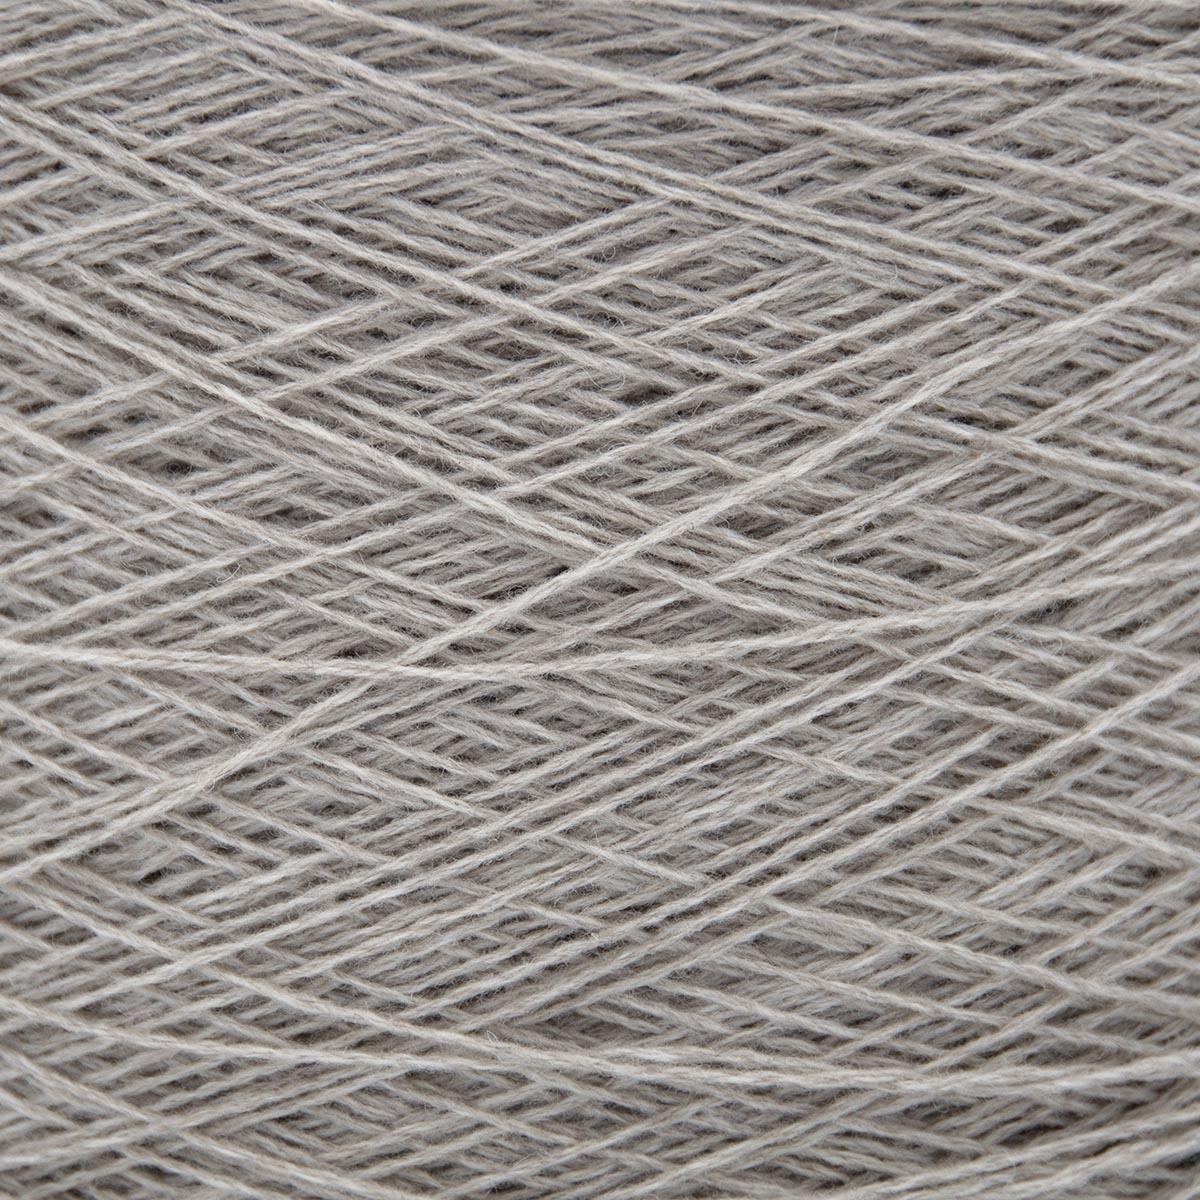 Knoll Yarns Merino Lambswool - 381